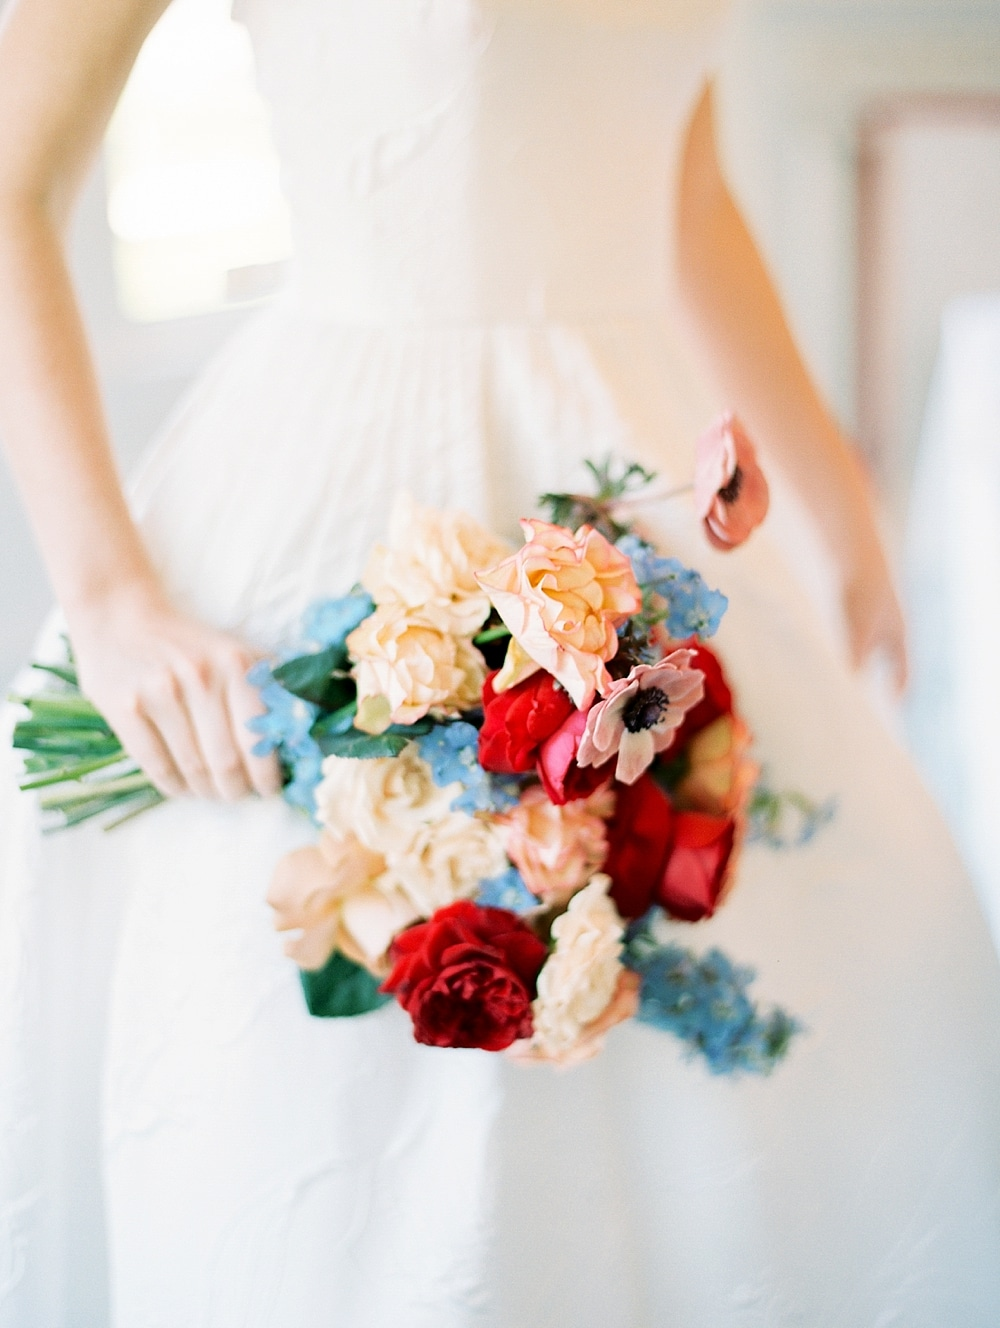 kristin-la-voie-photography-austin-wedding-photographer-woodbine-mansion-207